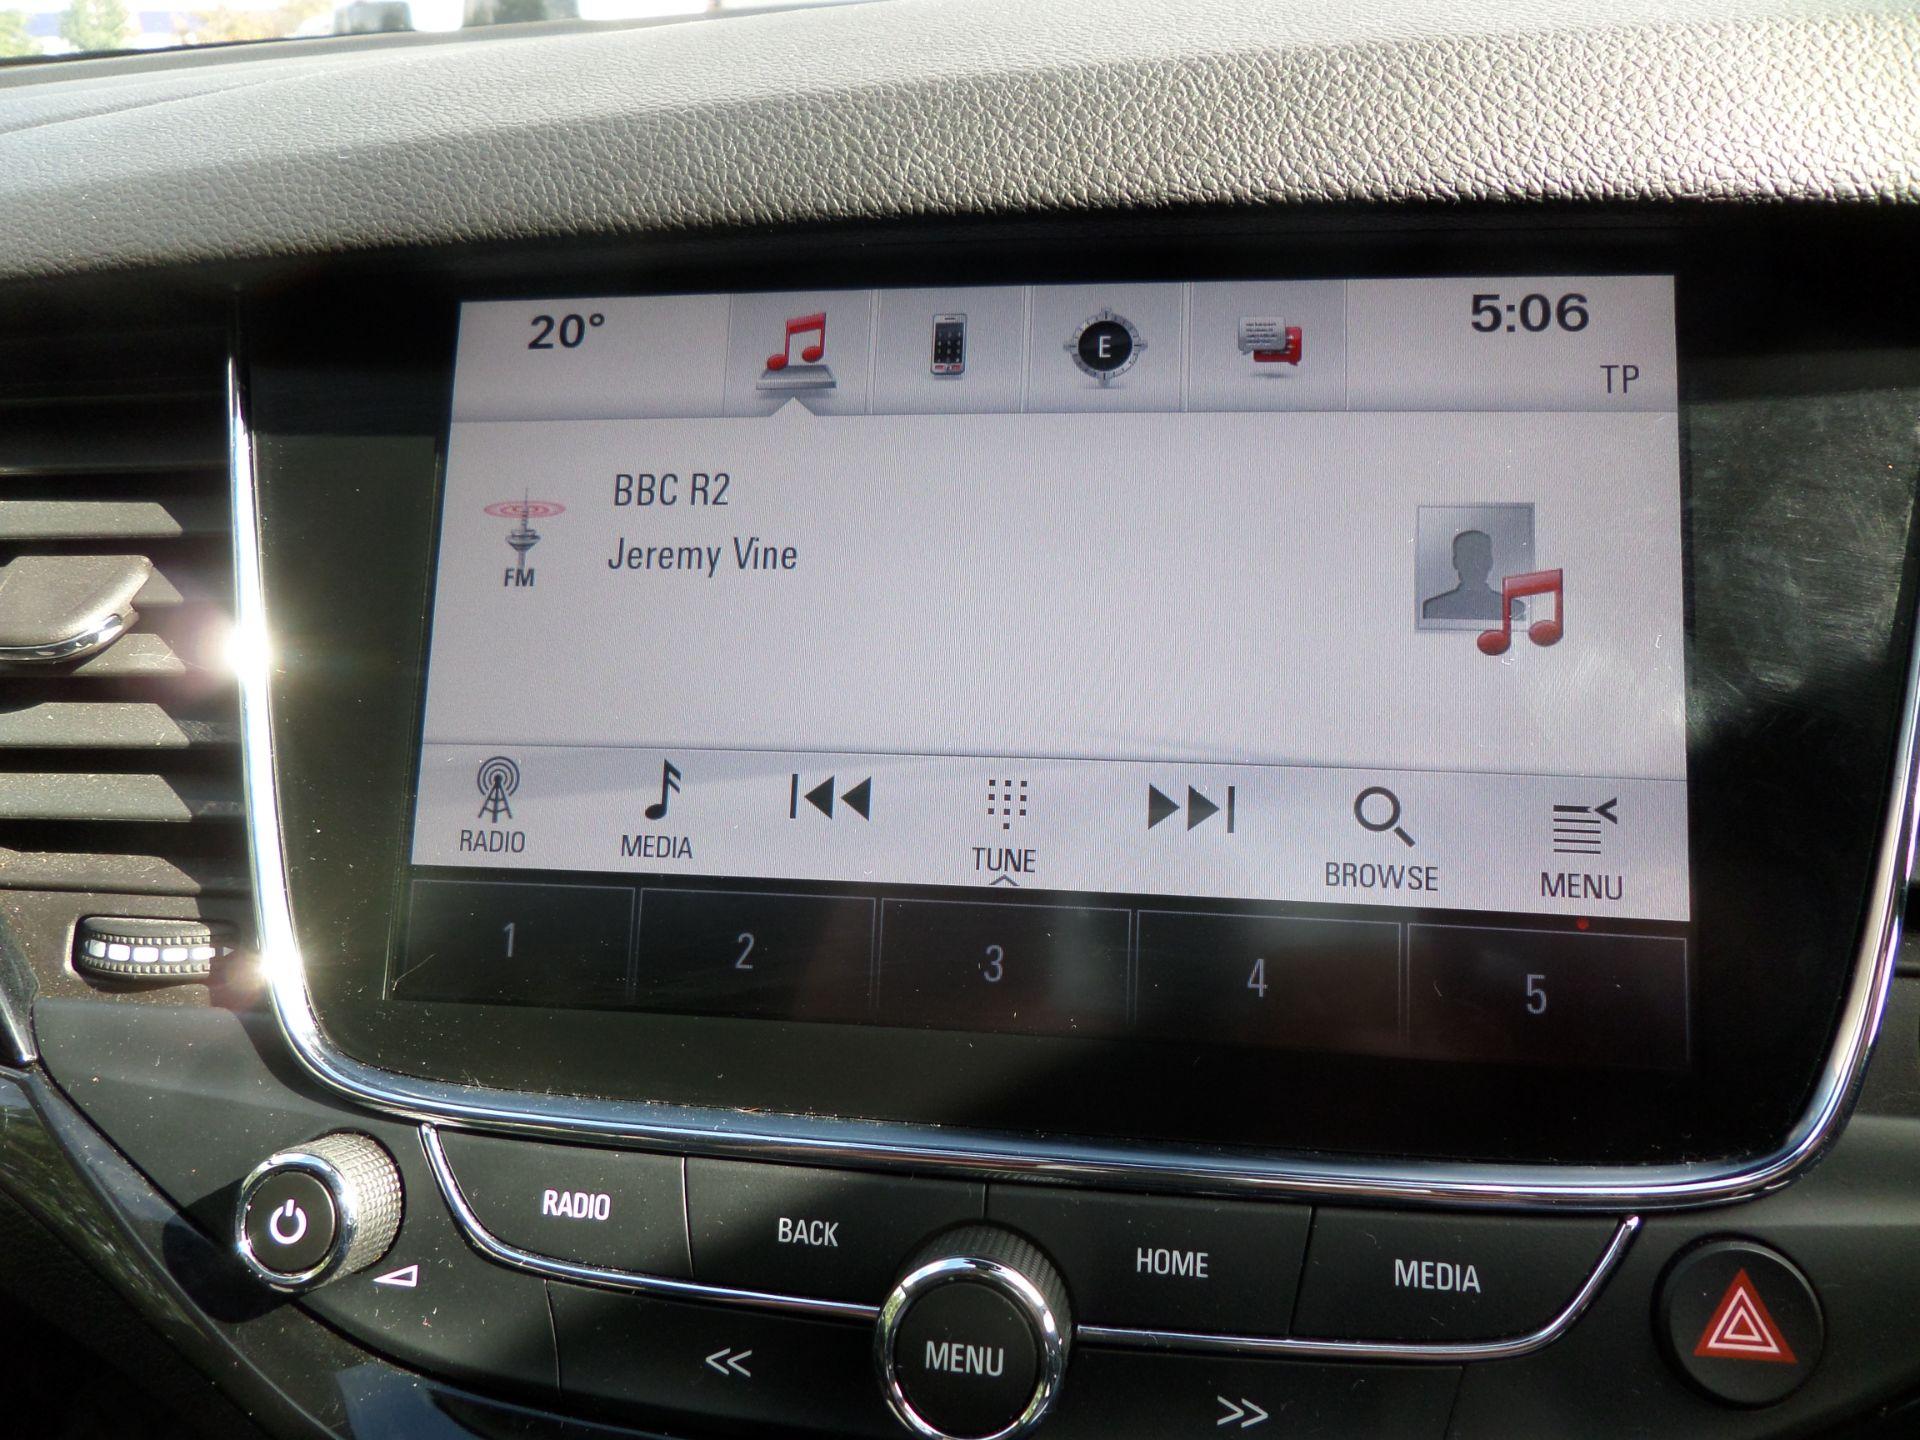 2018 Vauxhall Astra 1.6 Cdti 16V 136 Sri Nav 5Dr Euro 6 (DP18VCN) Image 13